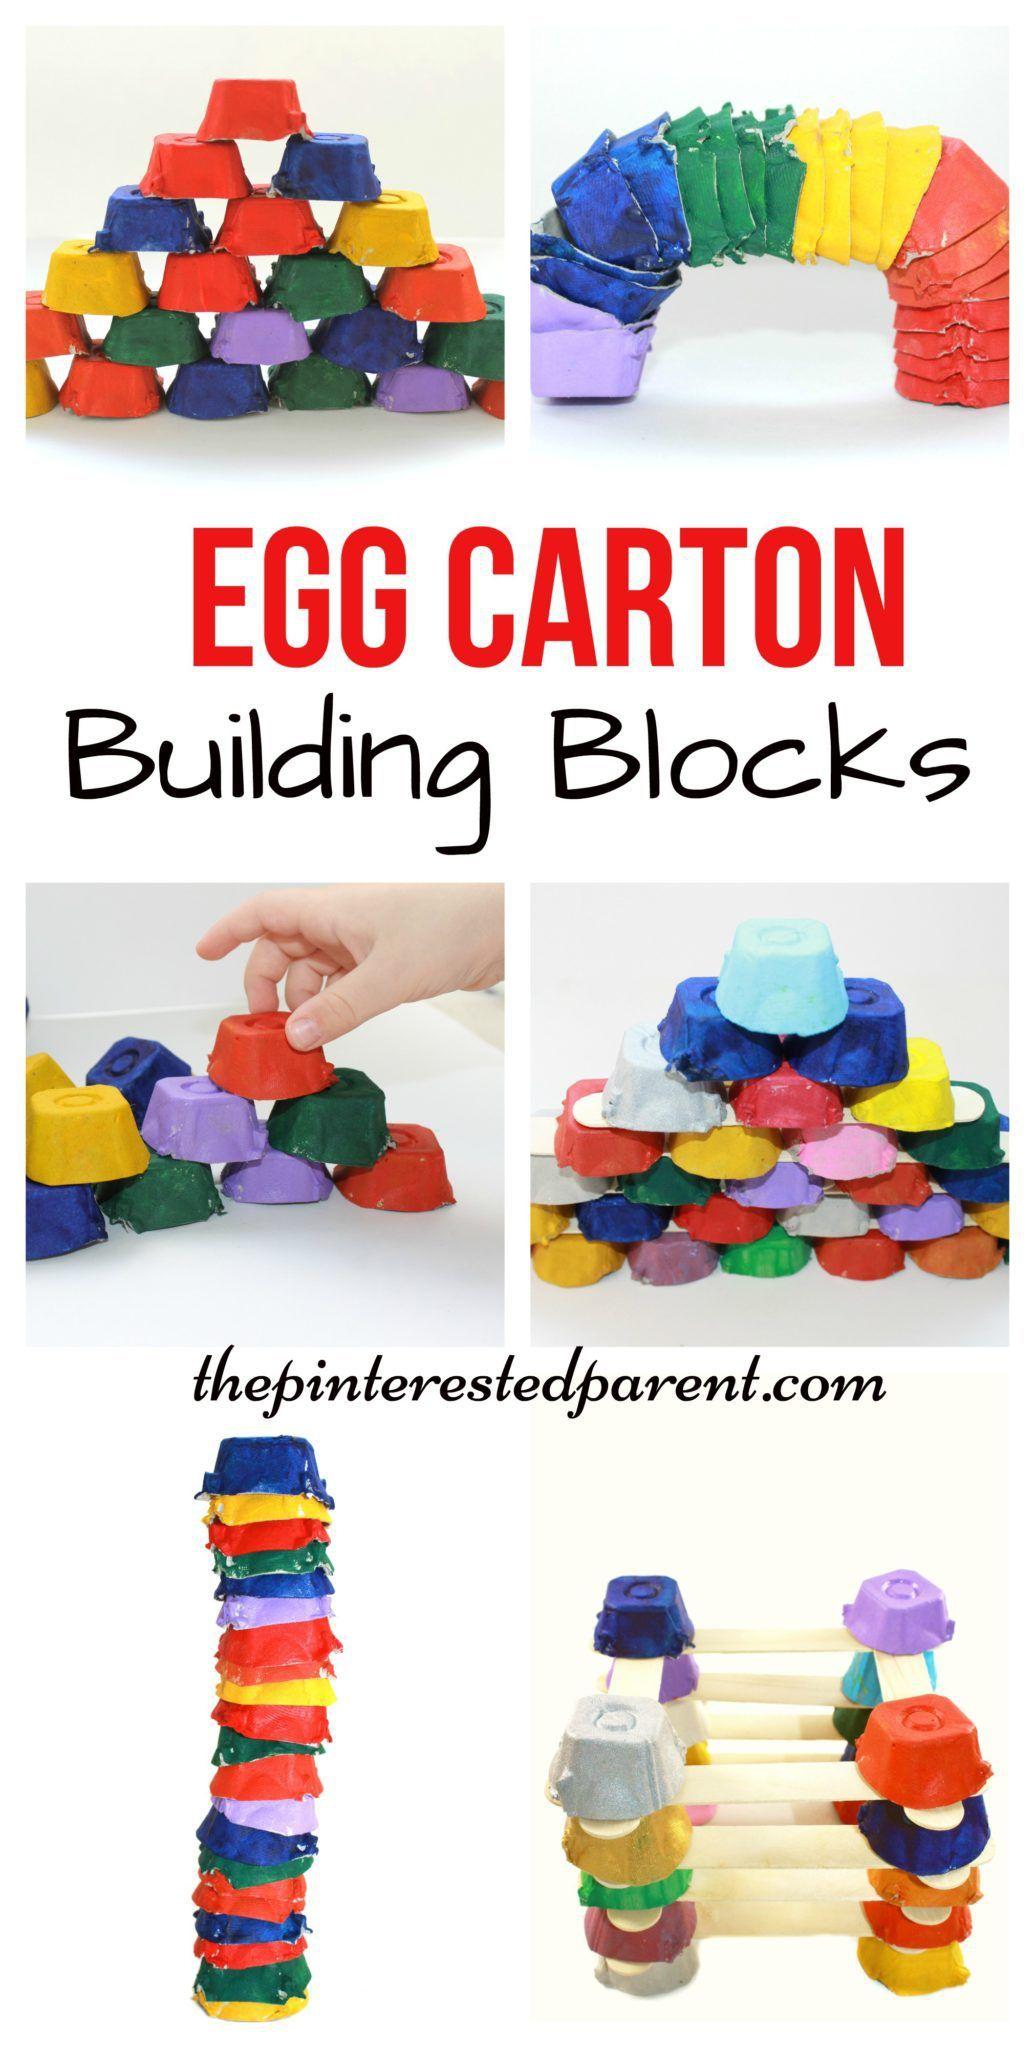 egg carton building blocks in 2018 kreative spielideen f r kinder pinterest einfaches. Black Bedroom Furniture Sets. Home Design Ideas